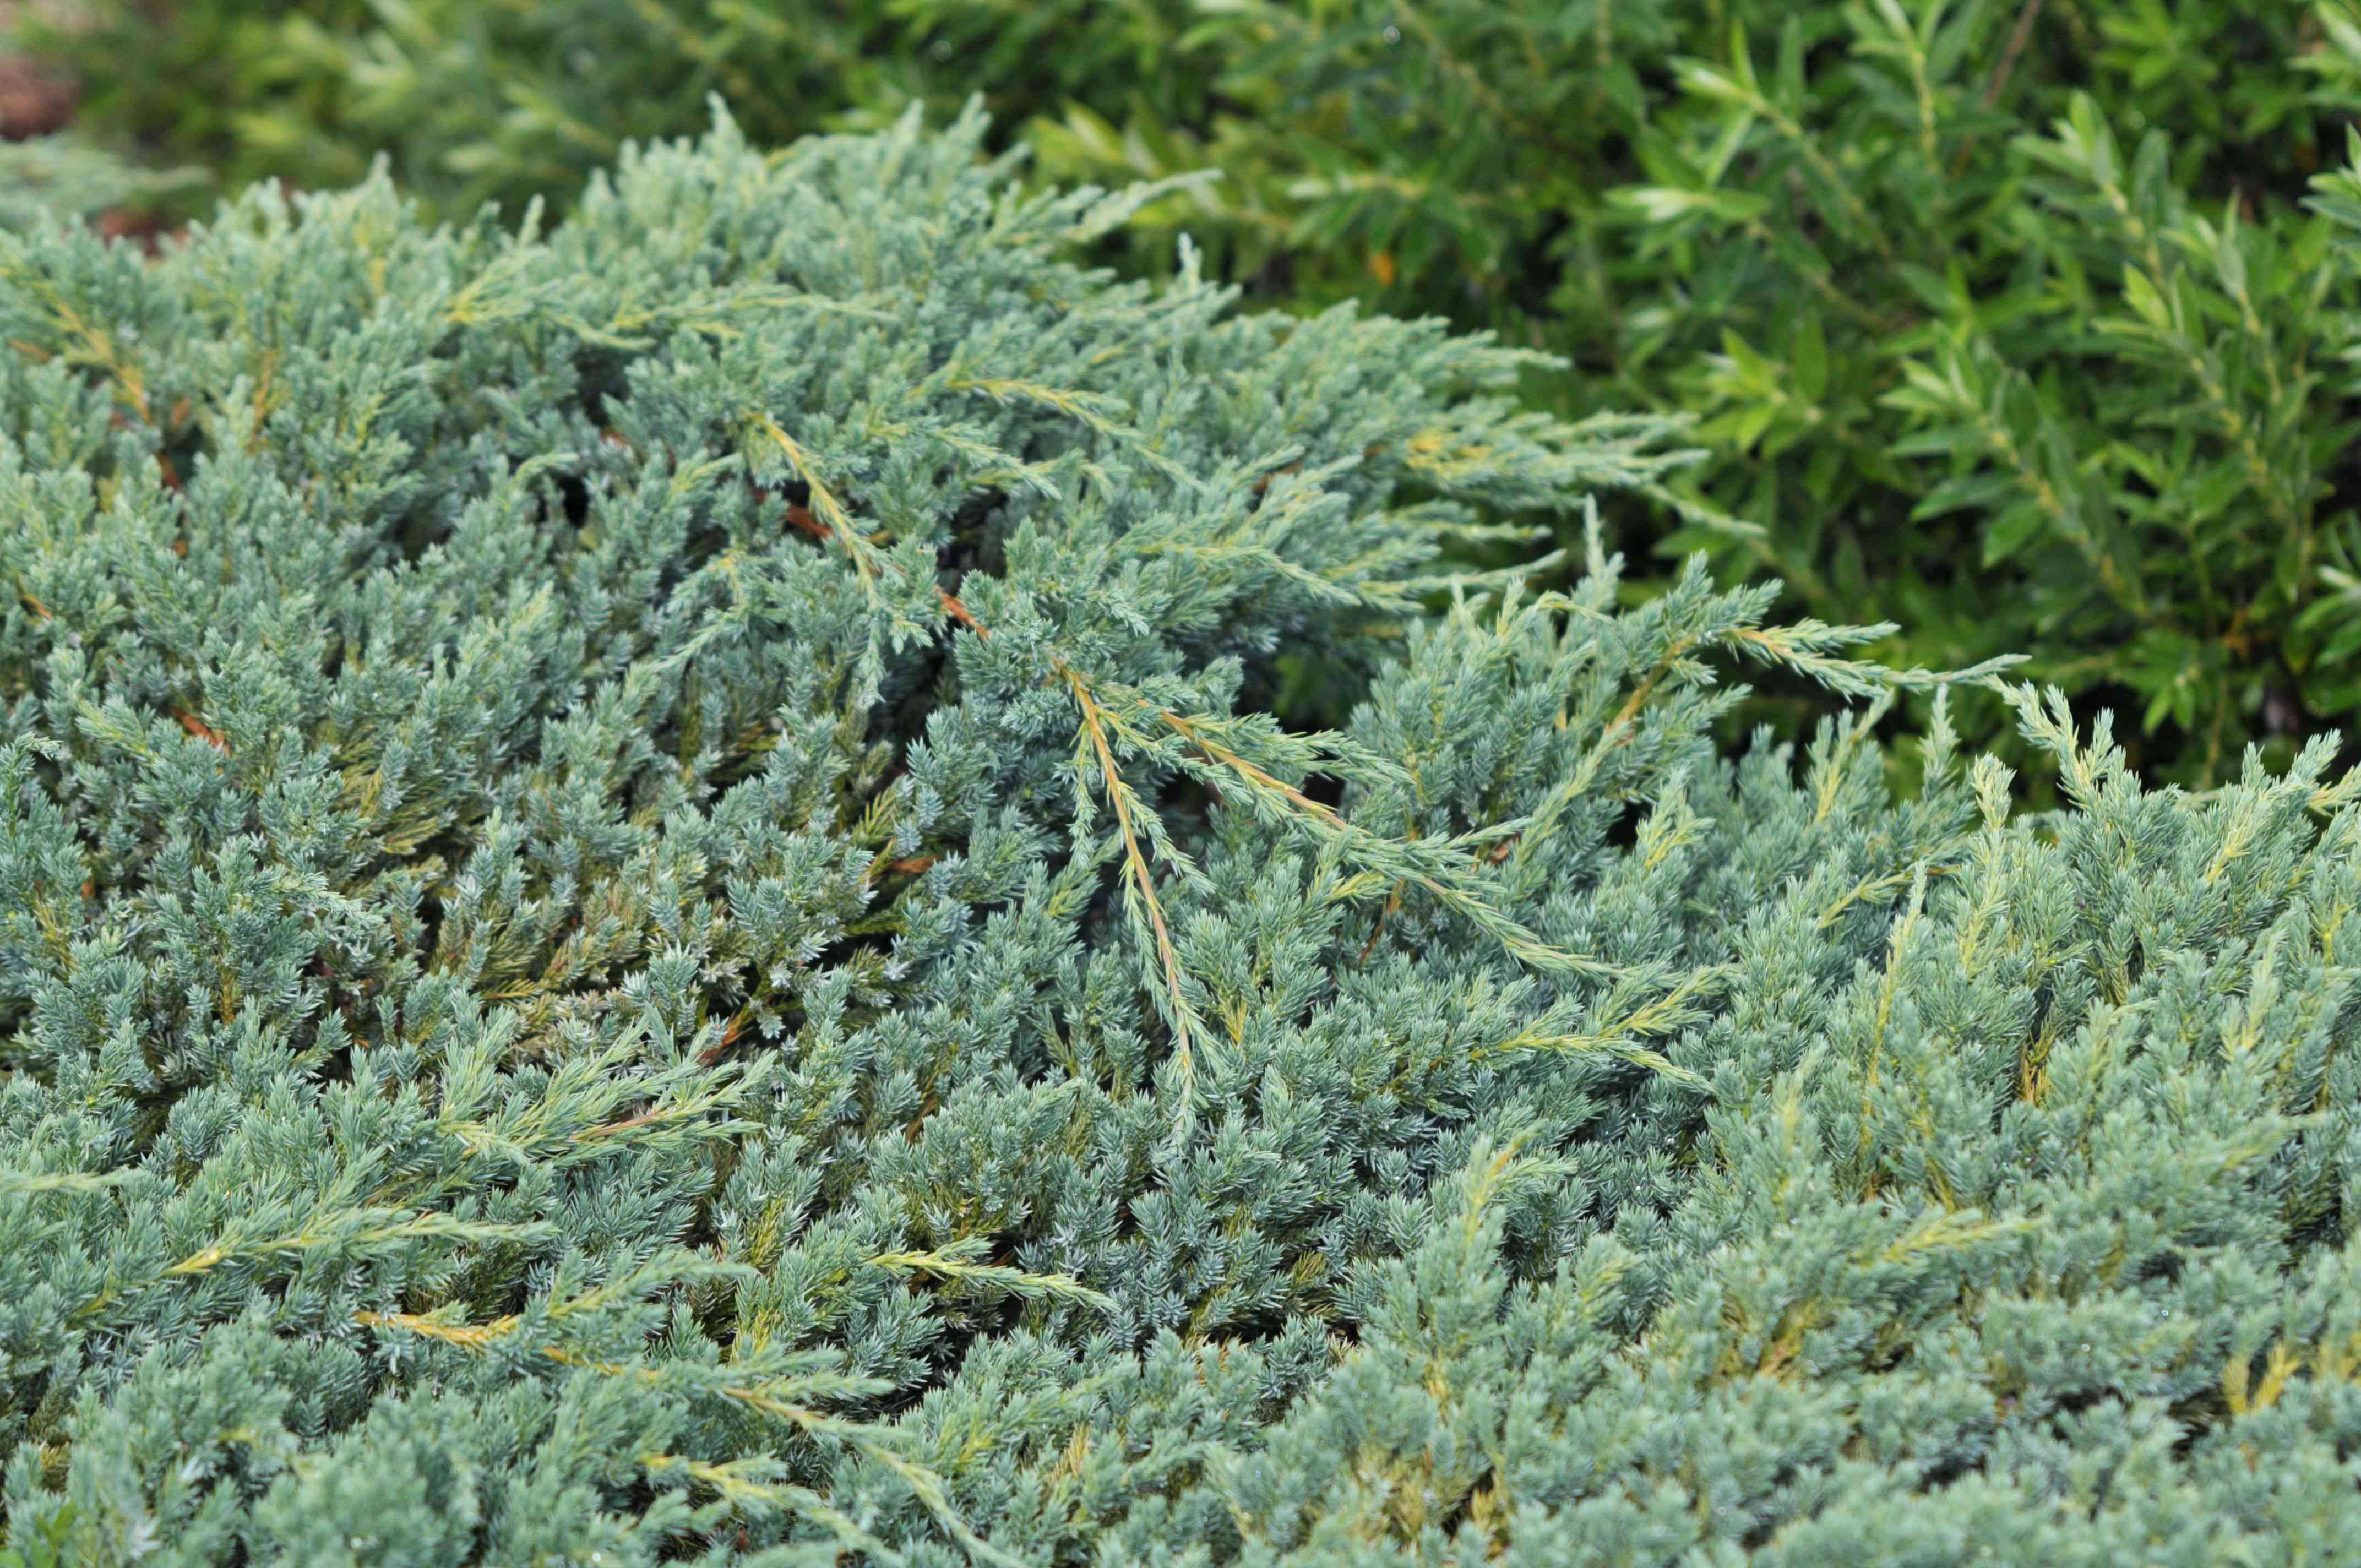 Creeping juniper shrub with blue-green scaly needles